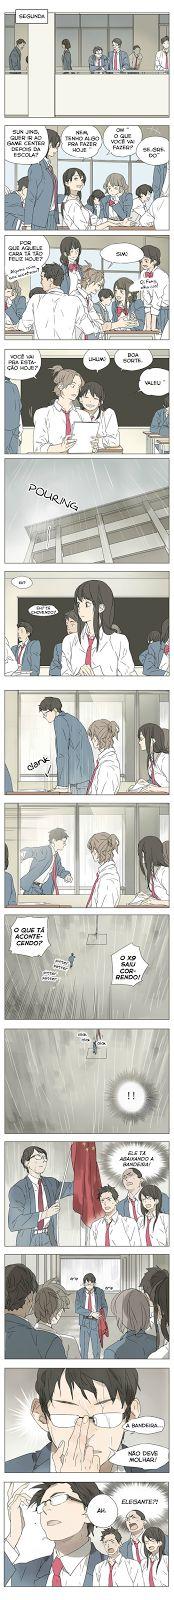 Armazém Yuri - Galeria de mangás: Tamen de Gushi - Capítulo 06